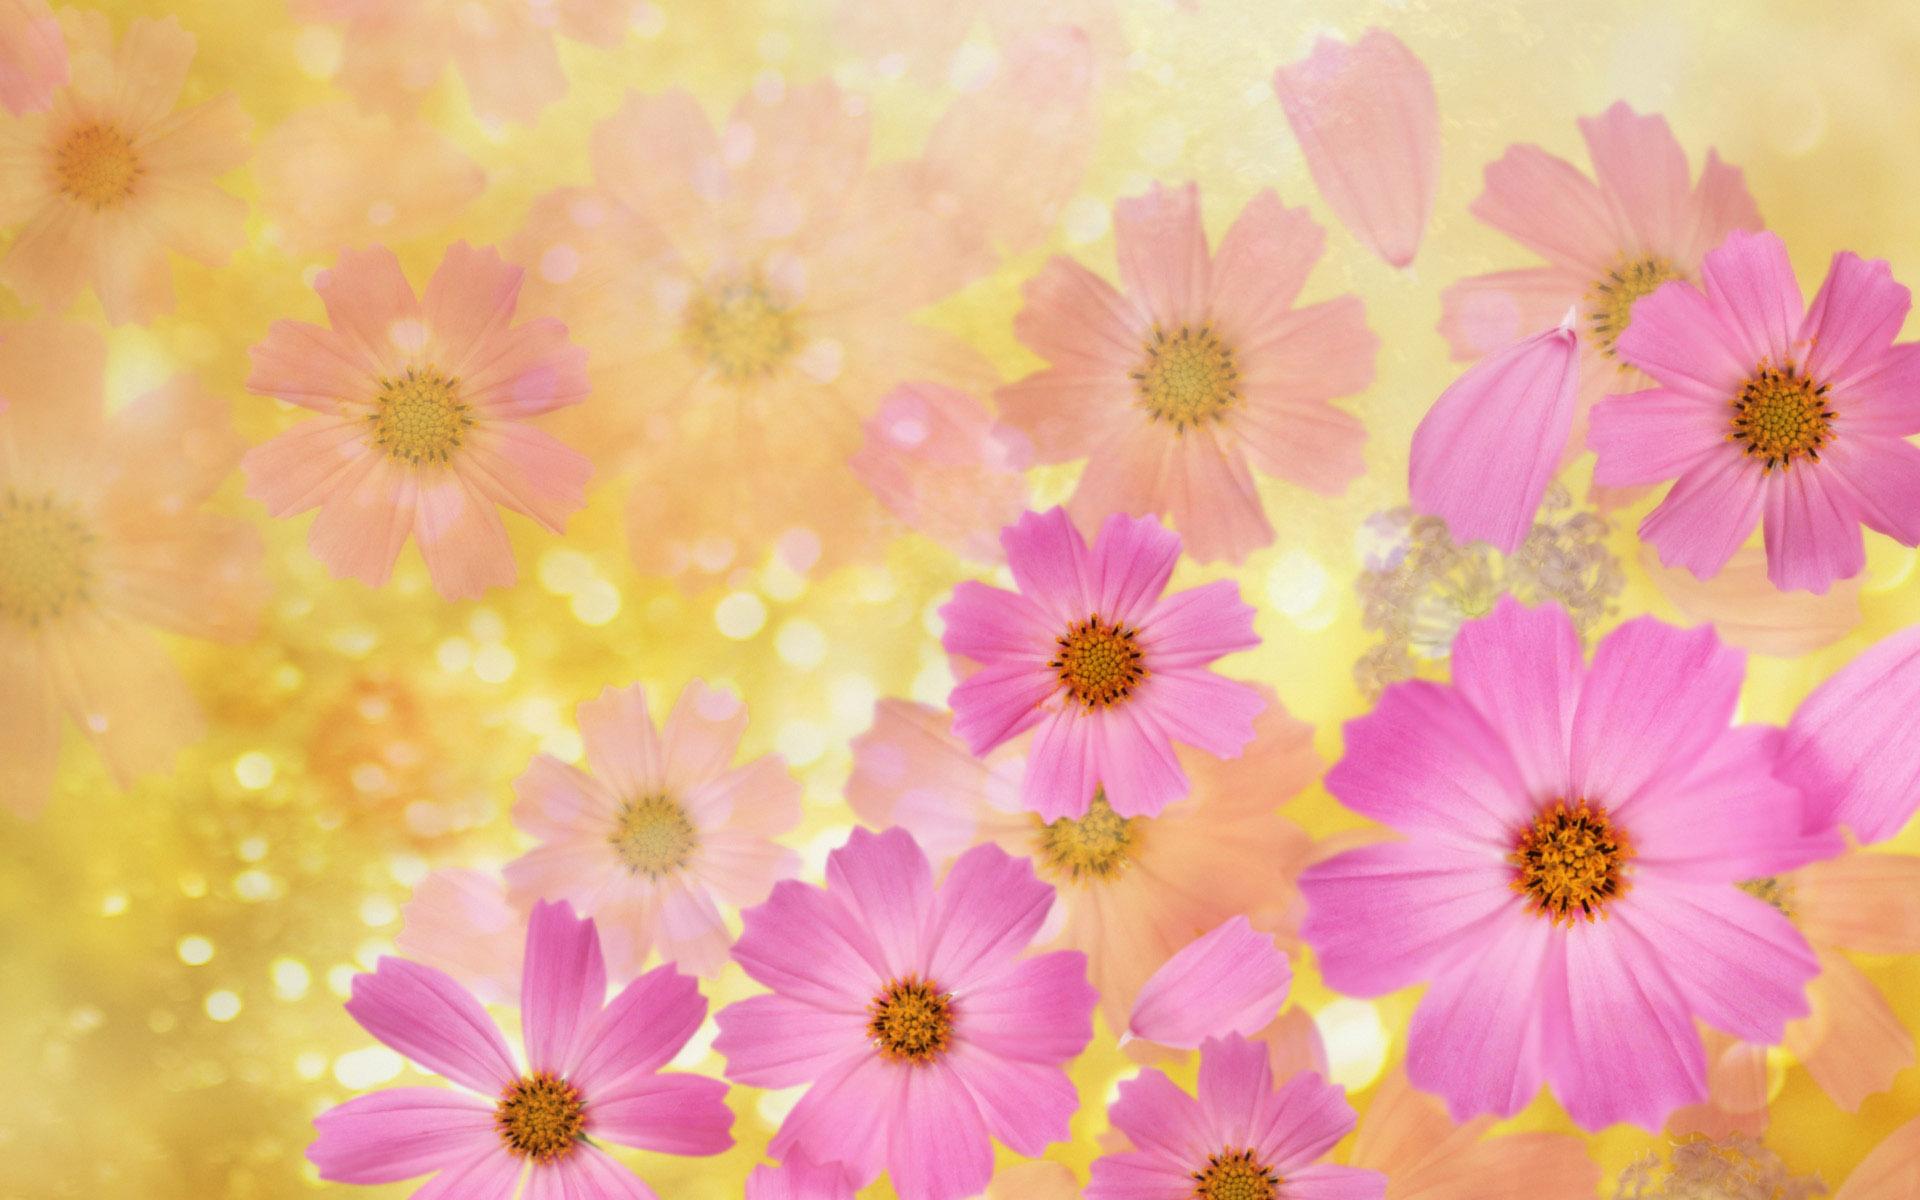 Cosmos flowers Wallpaper High Quality WallpapersWallpaper Desktop 1920x1200